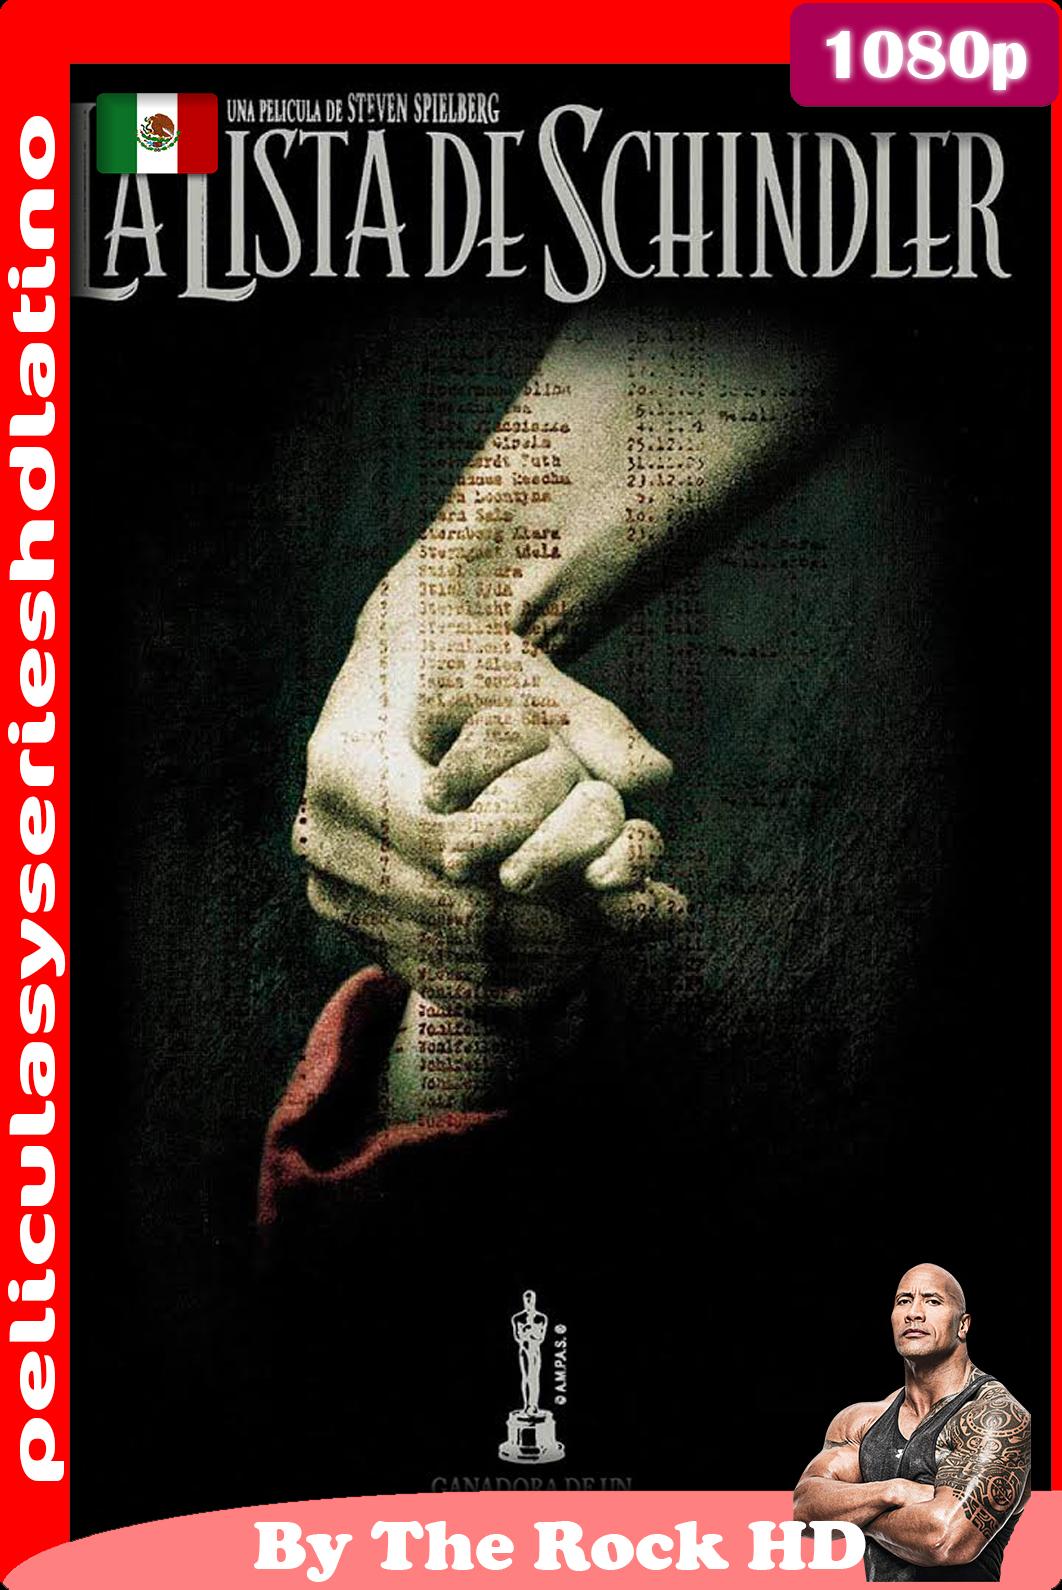 La lista de Schindler, (1993) [1080p] [Latino] [Google Drive]